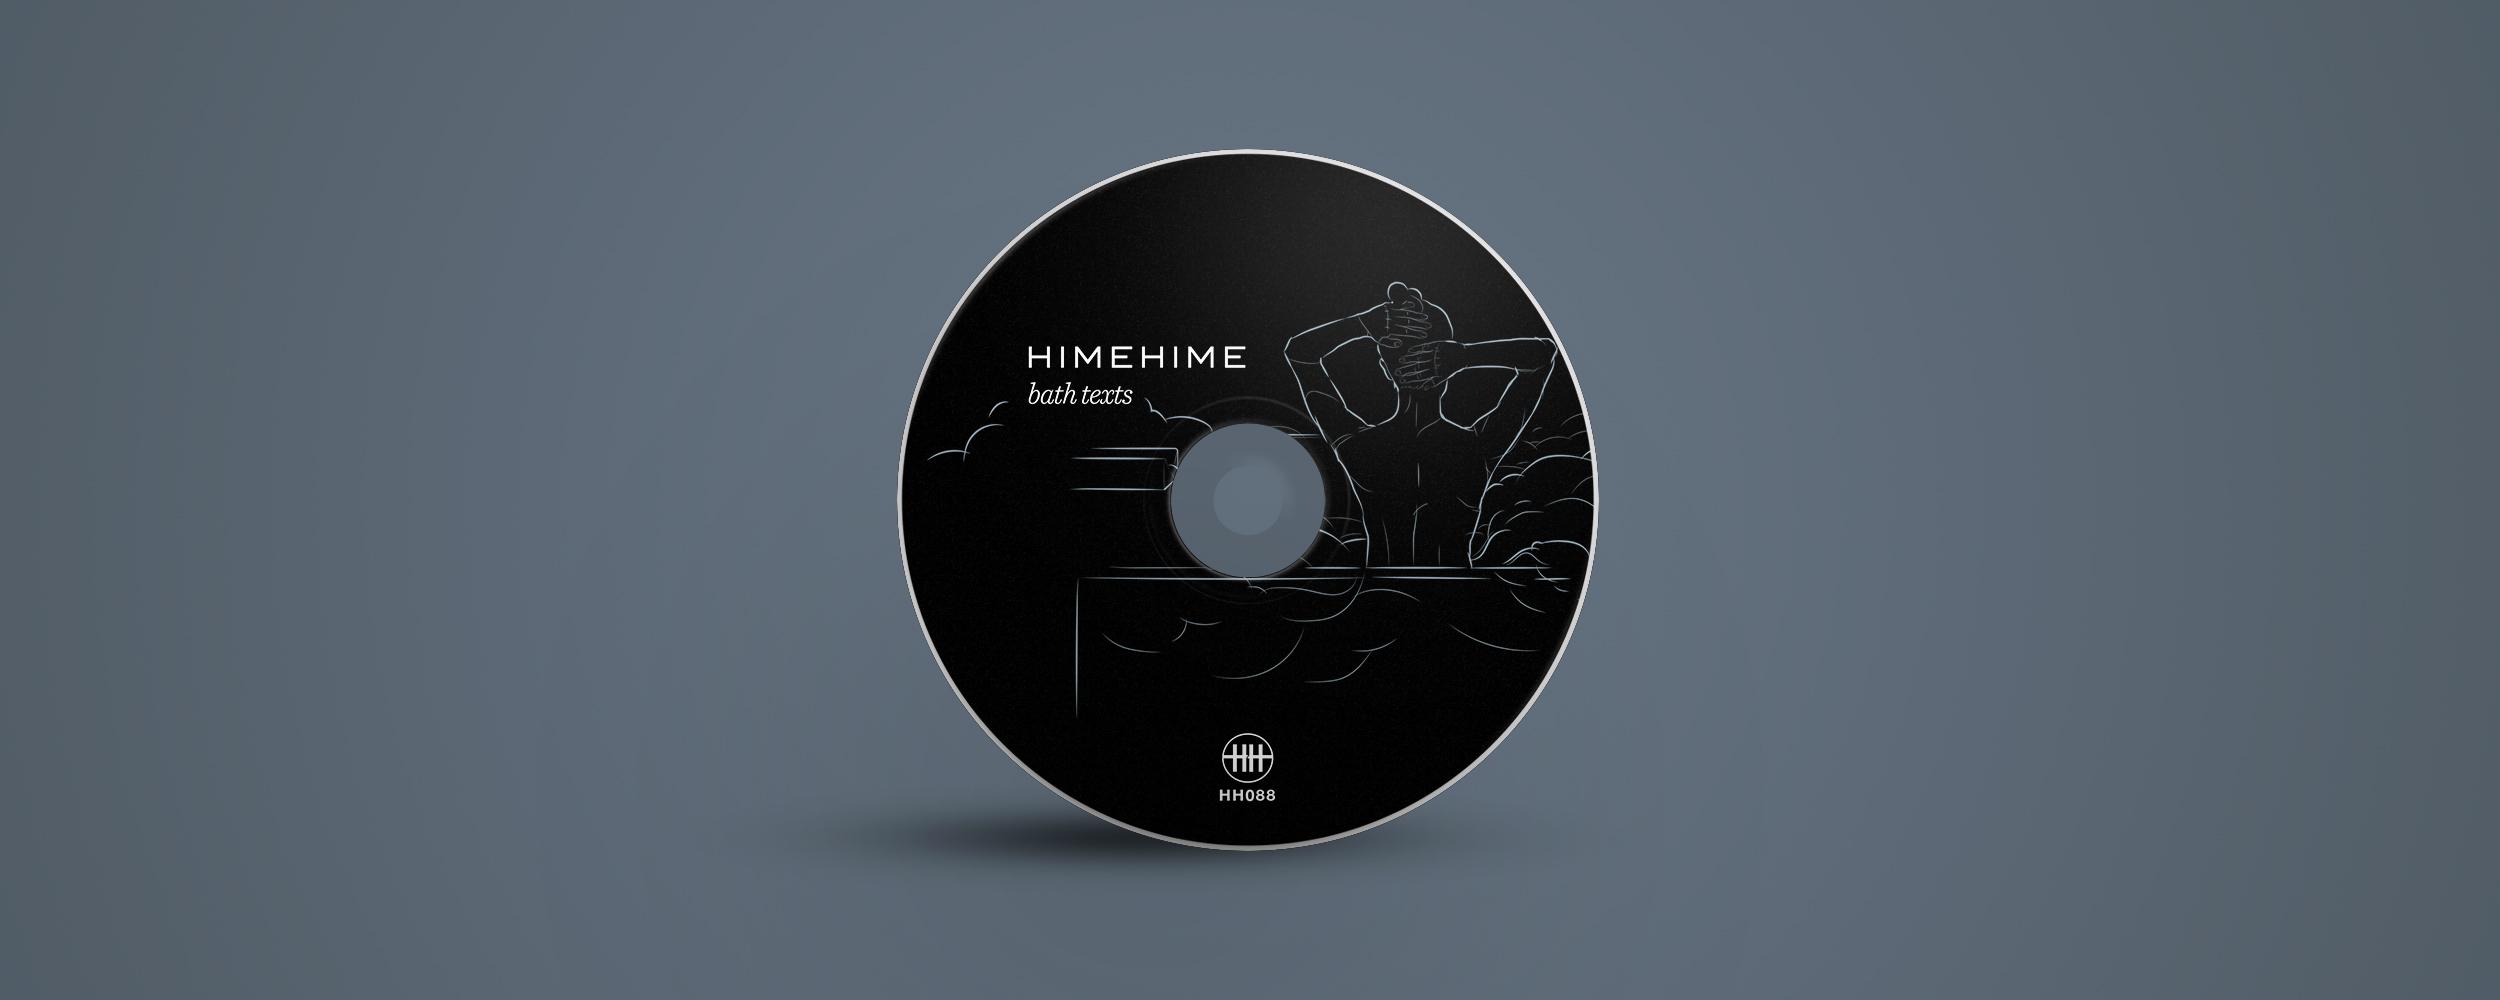 HIMEHIME_Mock_CD.jpg